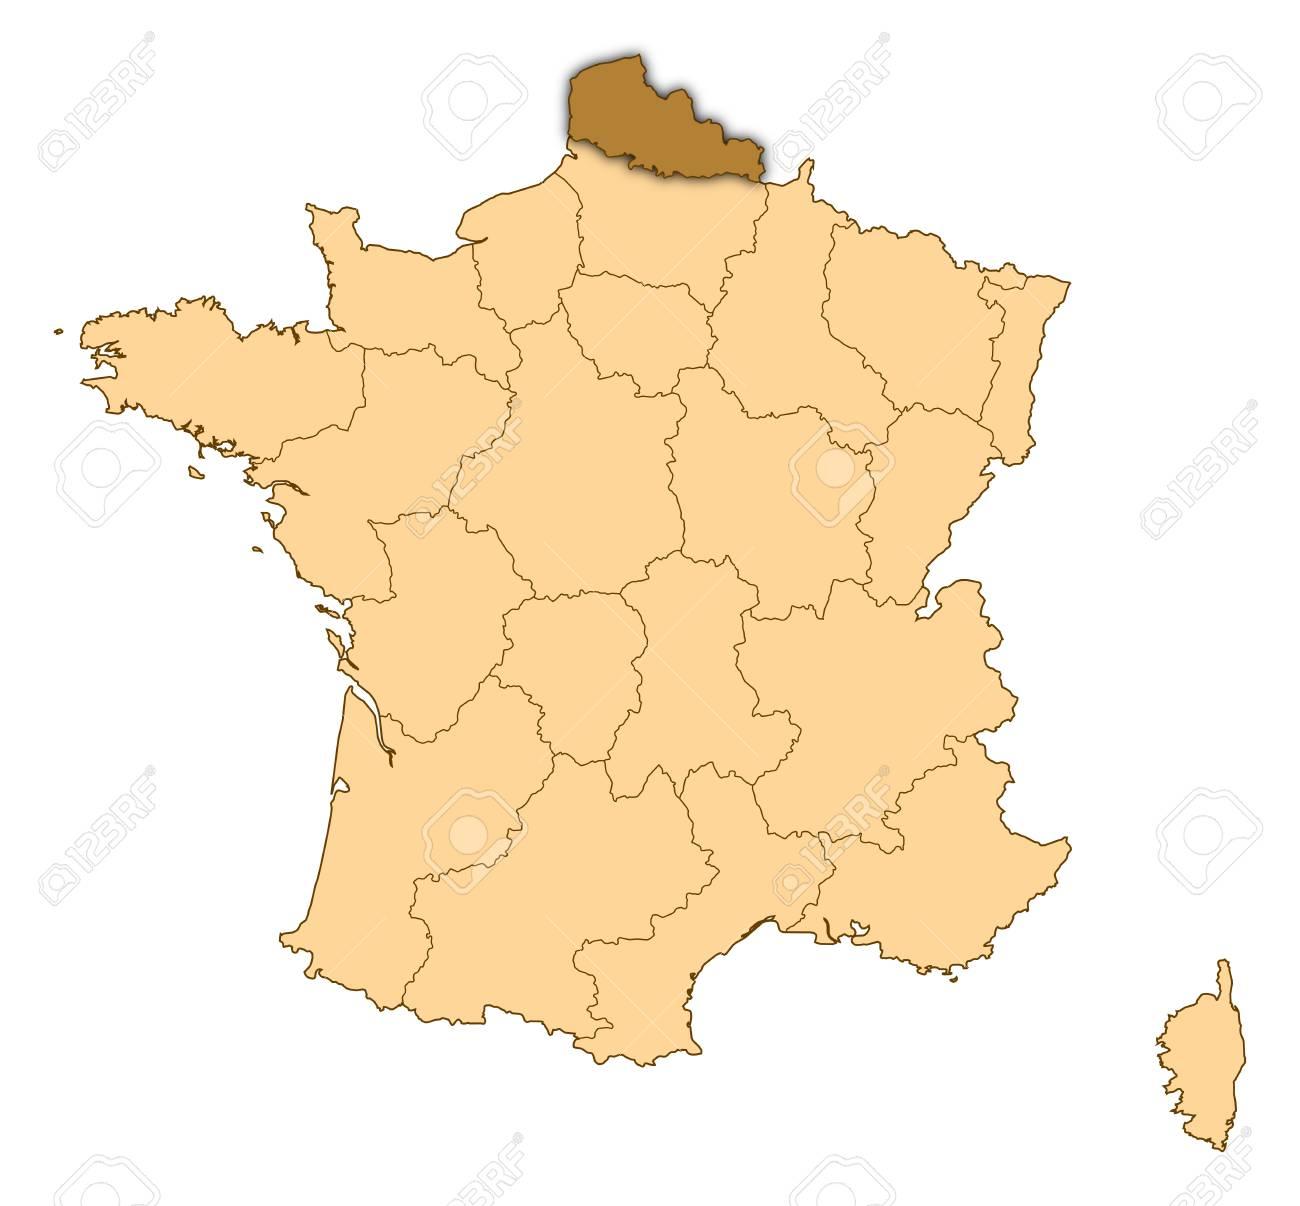 Map Of France Calais.Map Of France Where Nord Pas De Calais Is Highlighted